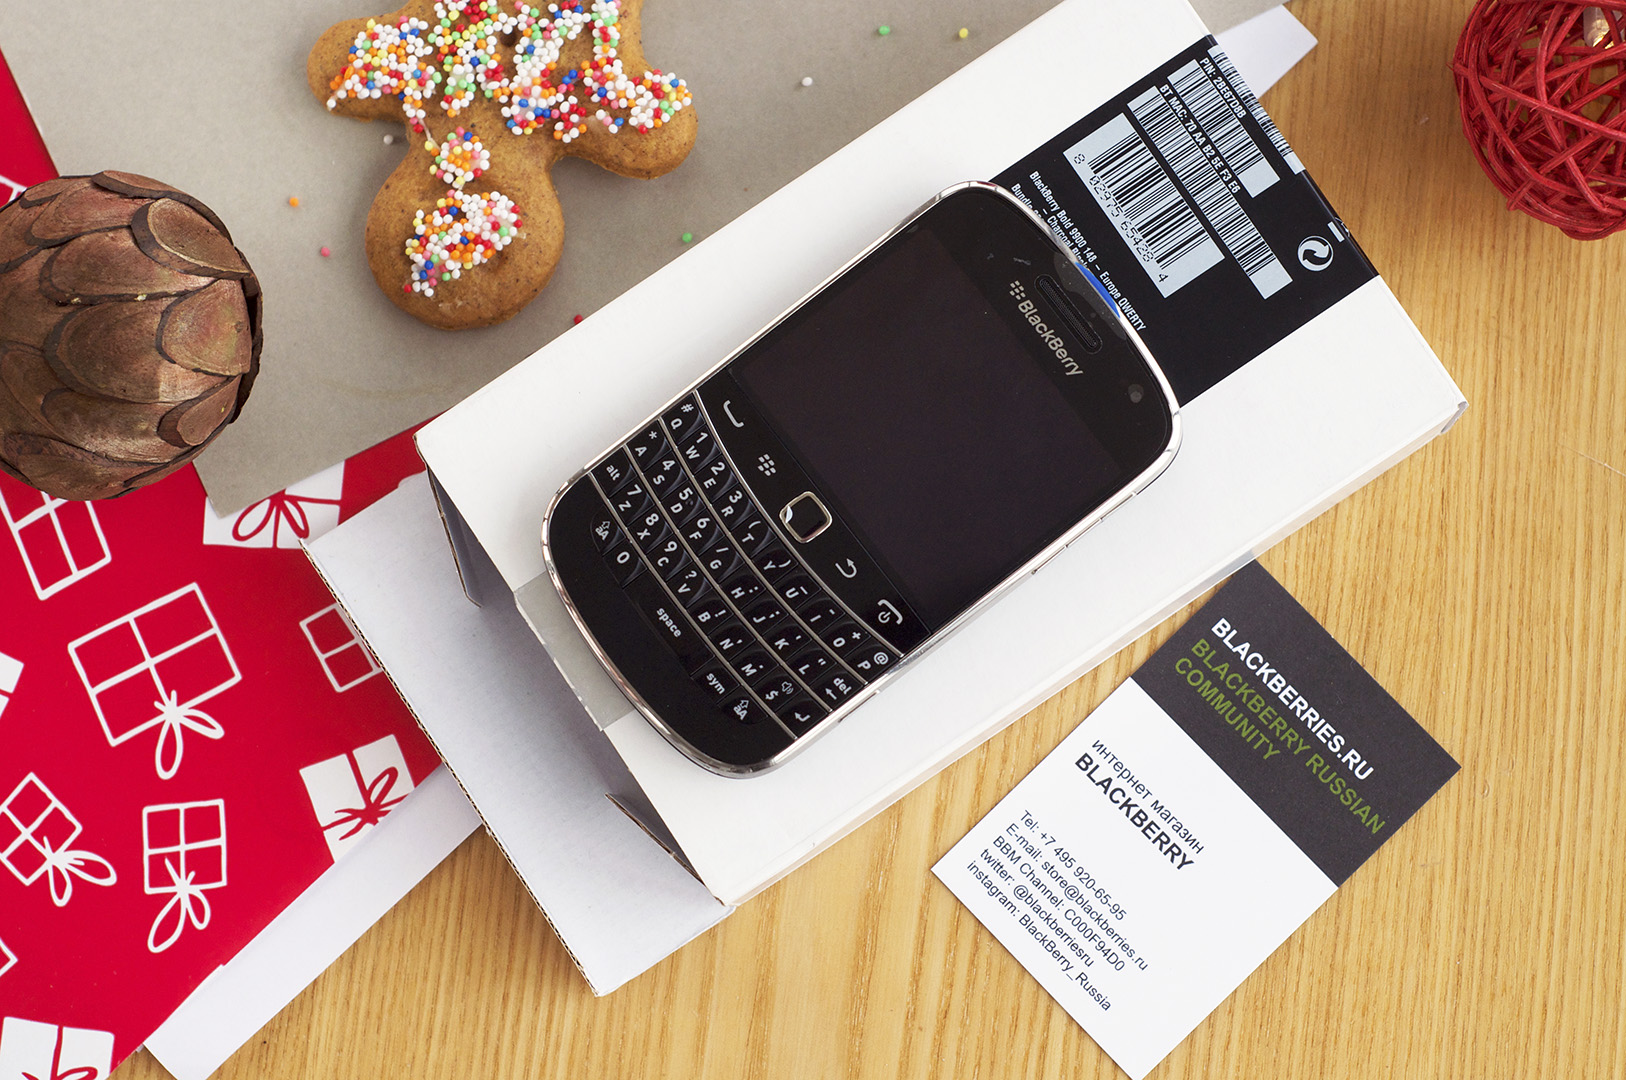 blackberry-9900-bold-2014-7